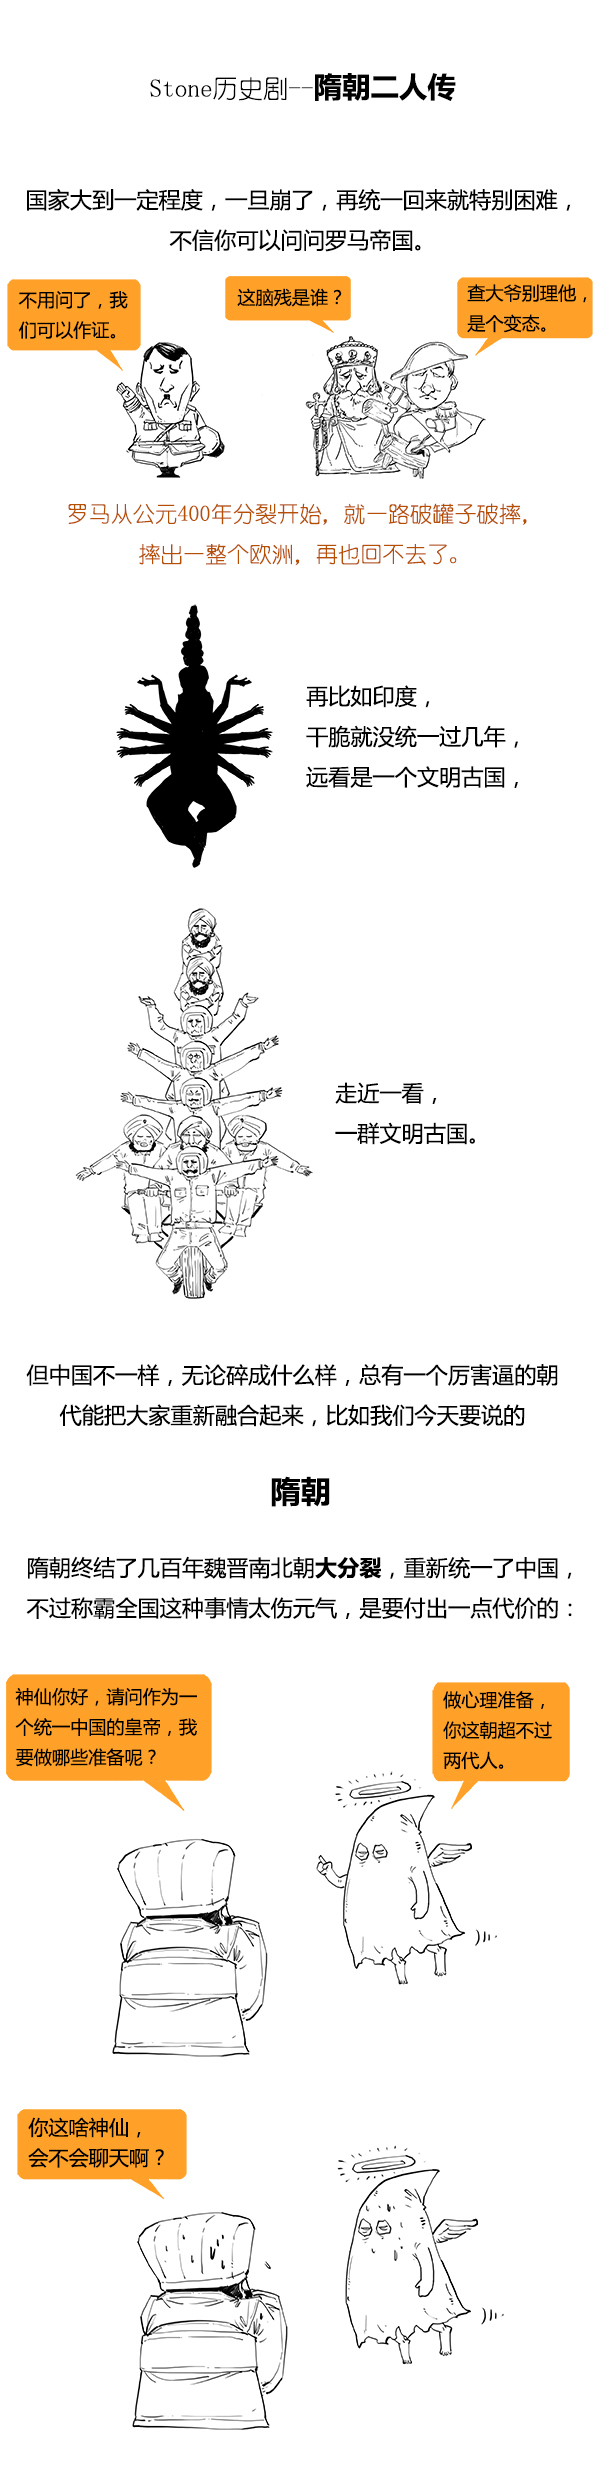 Stone历史剧-隋_01.png